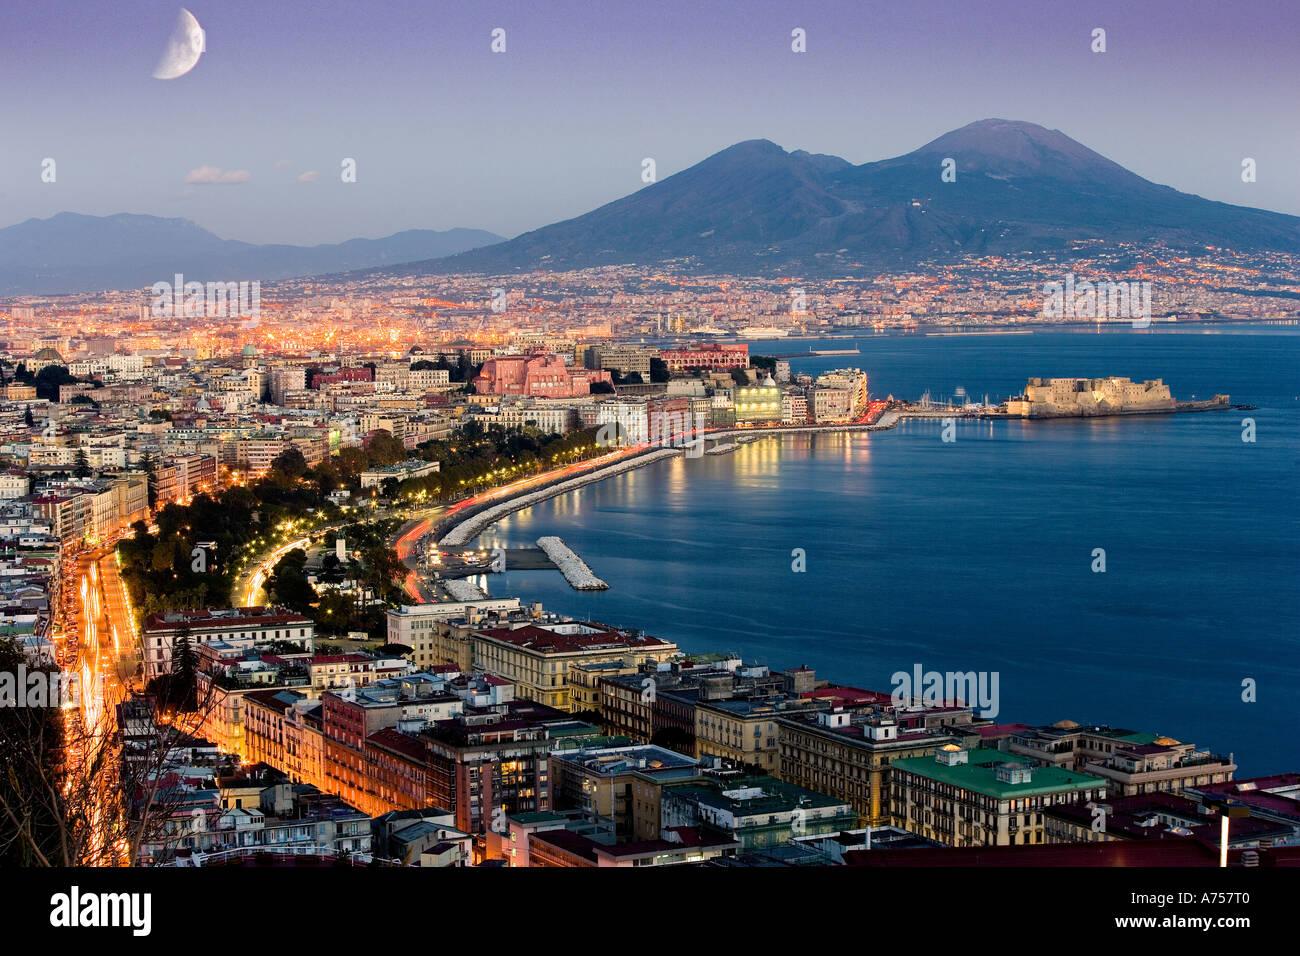 Grand Hotel Europa Neapel